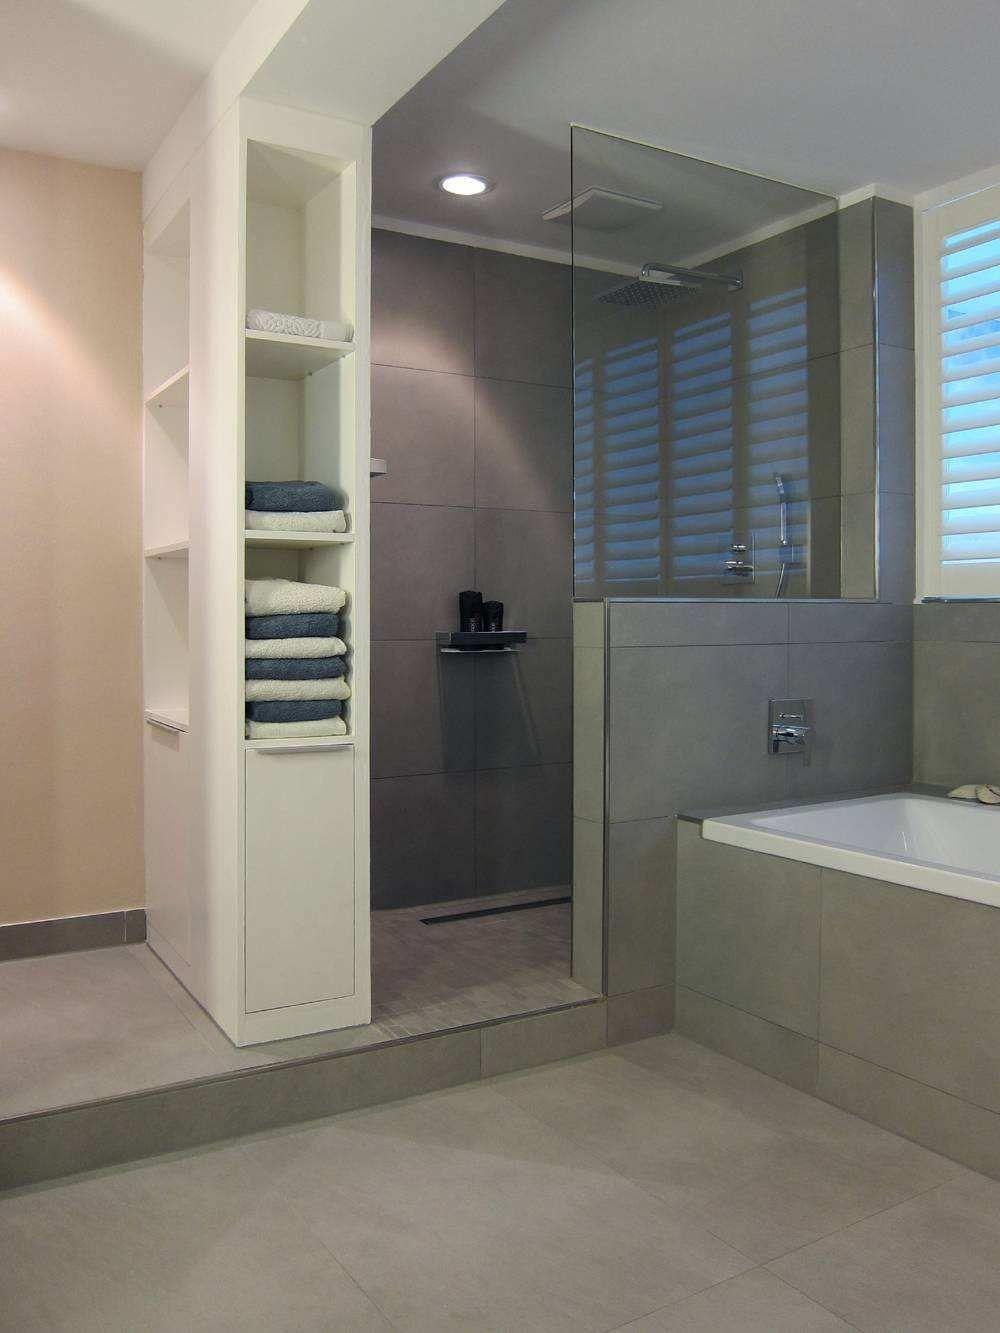 Bildergebnis Fur Walk In Dusche Gemauert Dusche Fliesen Graue Fliesen Badezimmer